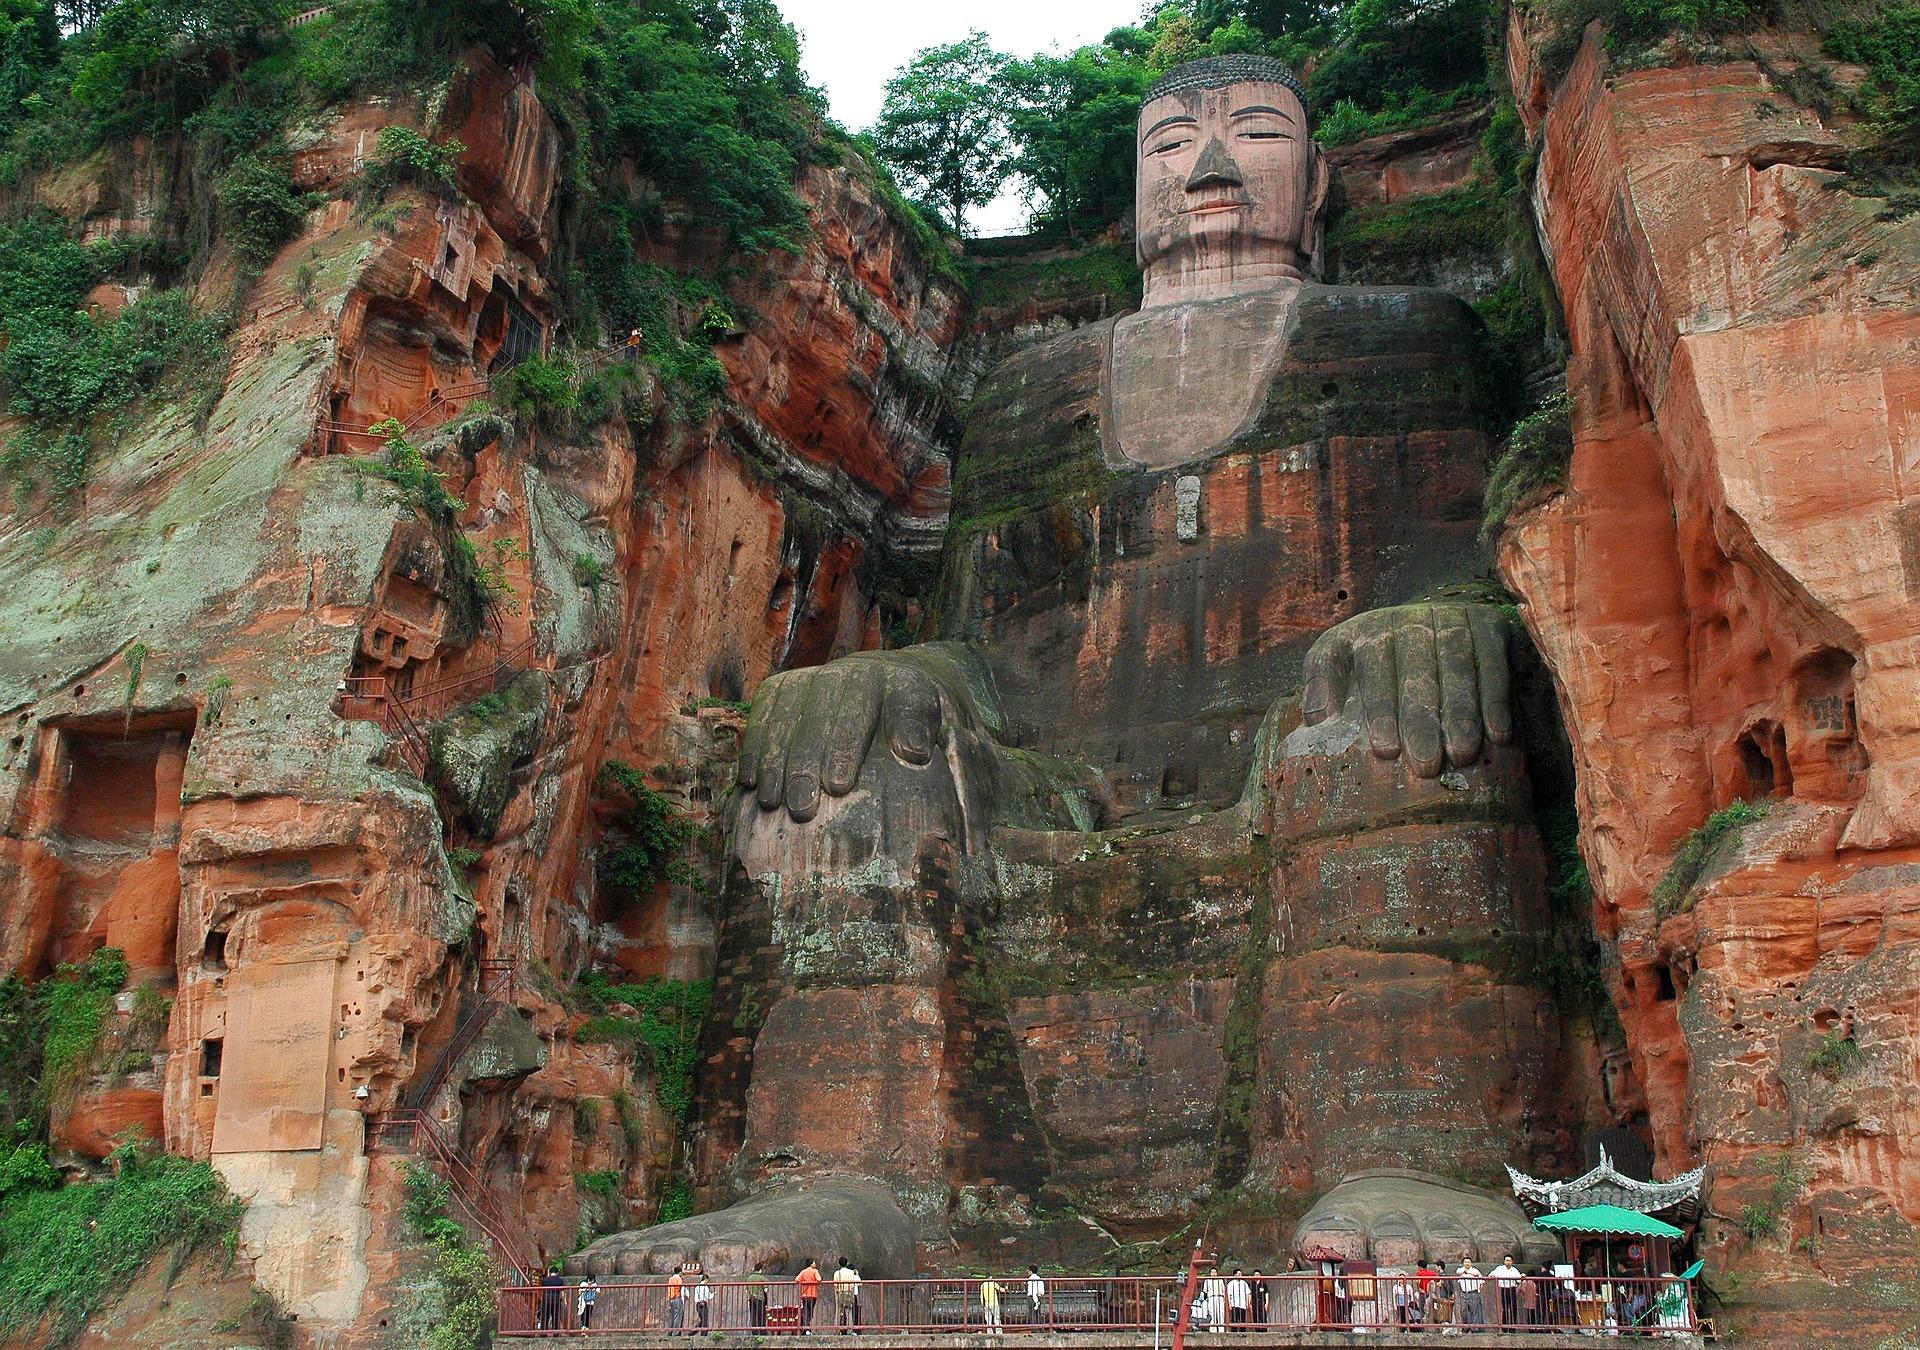 Leshin Buddha | Backpacking with Bacon | Budget Travel Blog